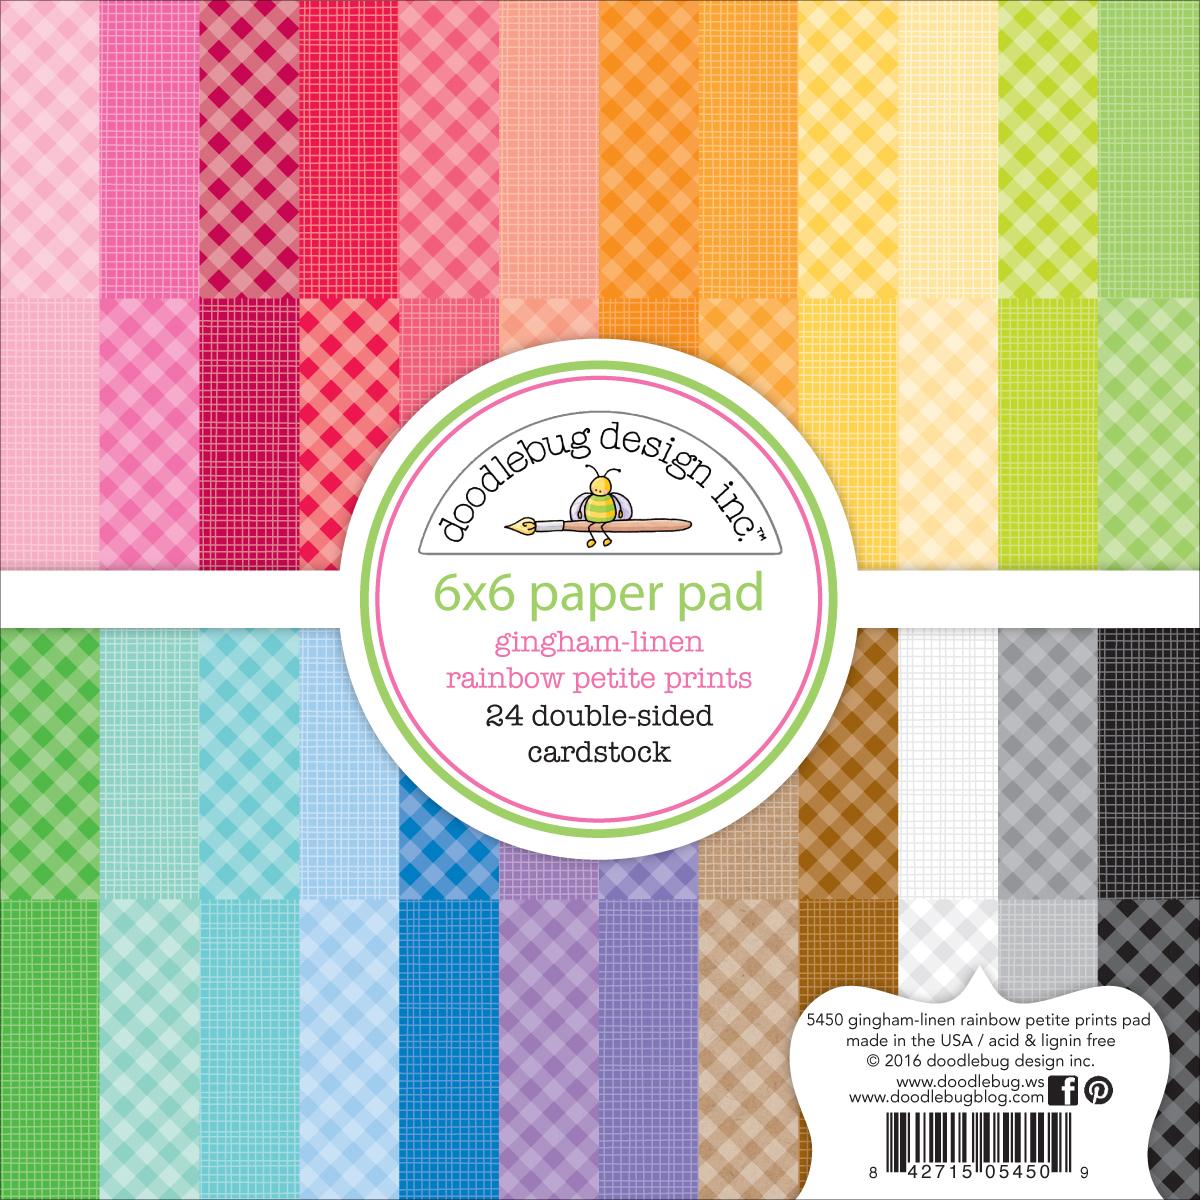 Doodlebug Petite Prints Gingham/Linen Pad 6X6 24/Pkg